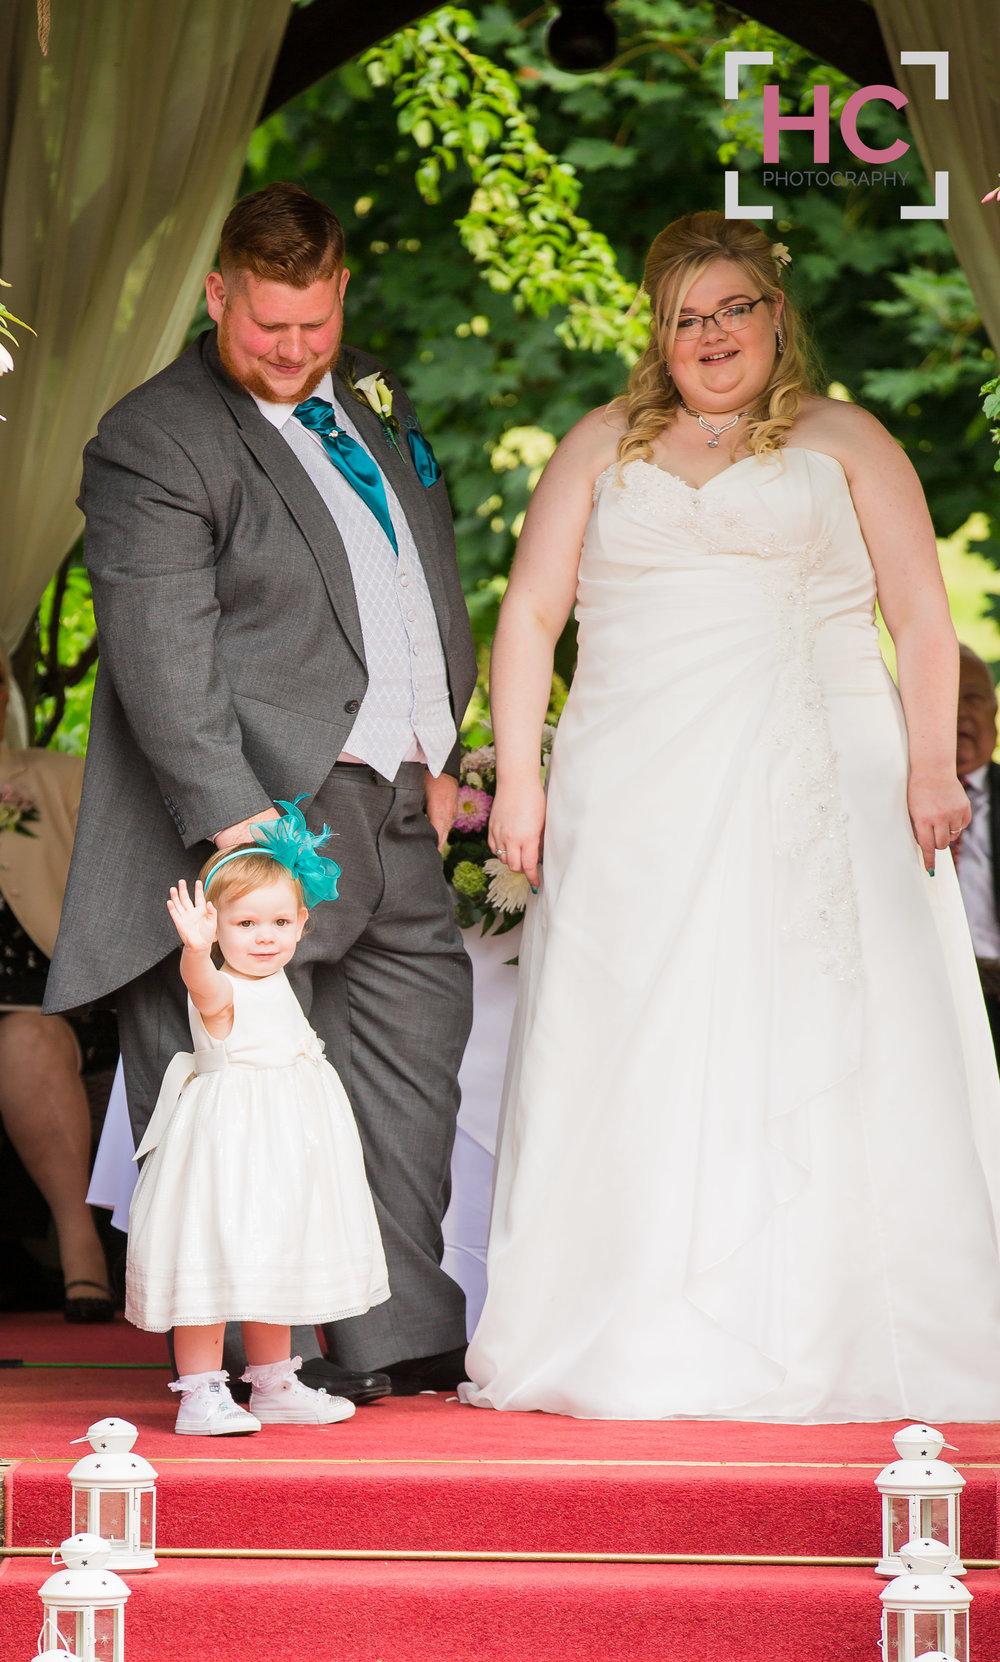 Chloe & Pete's Wedding_Helen Cotton Photography©29.JPG